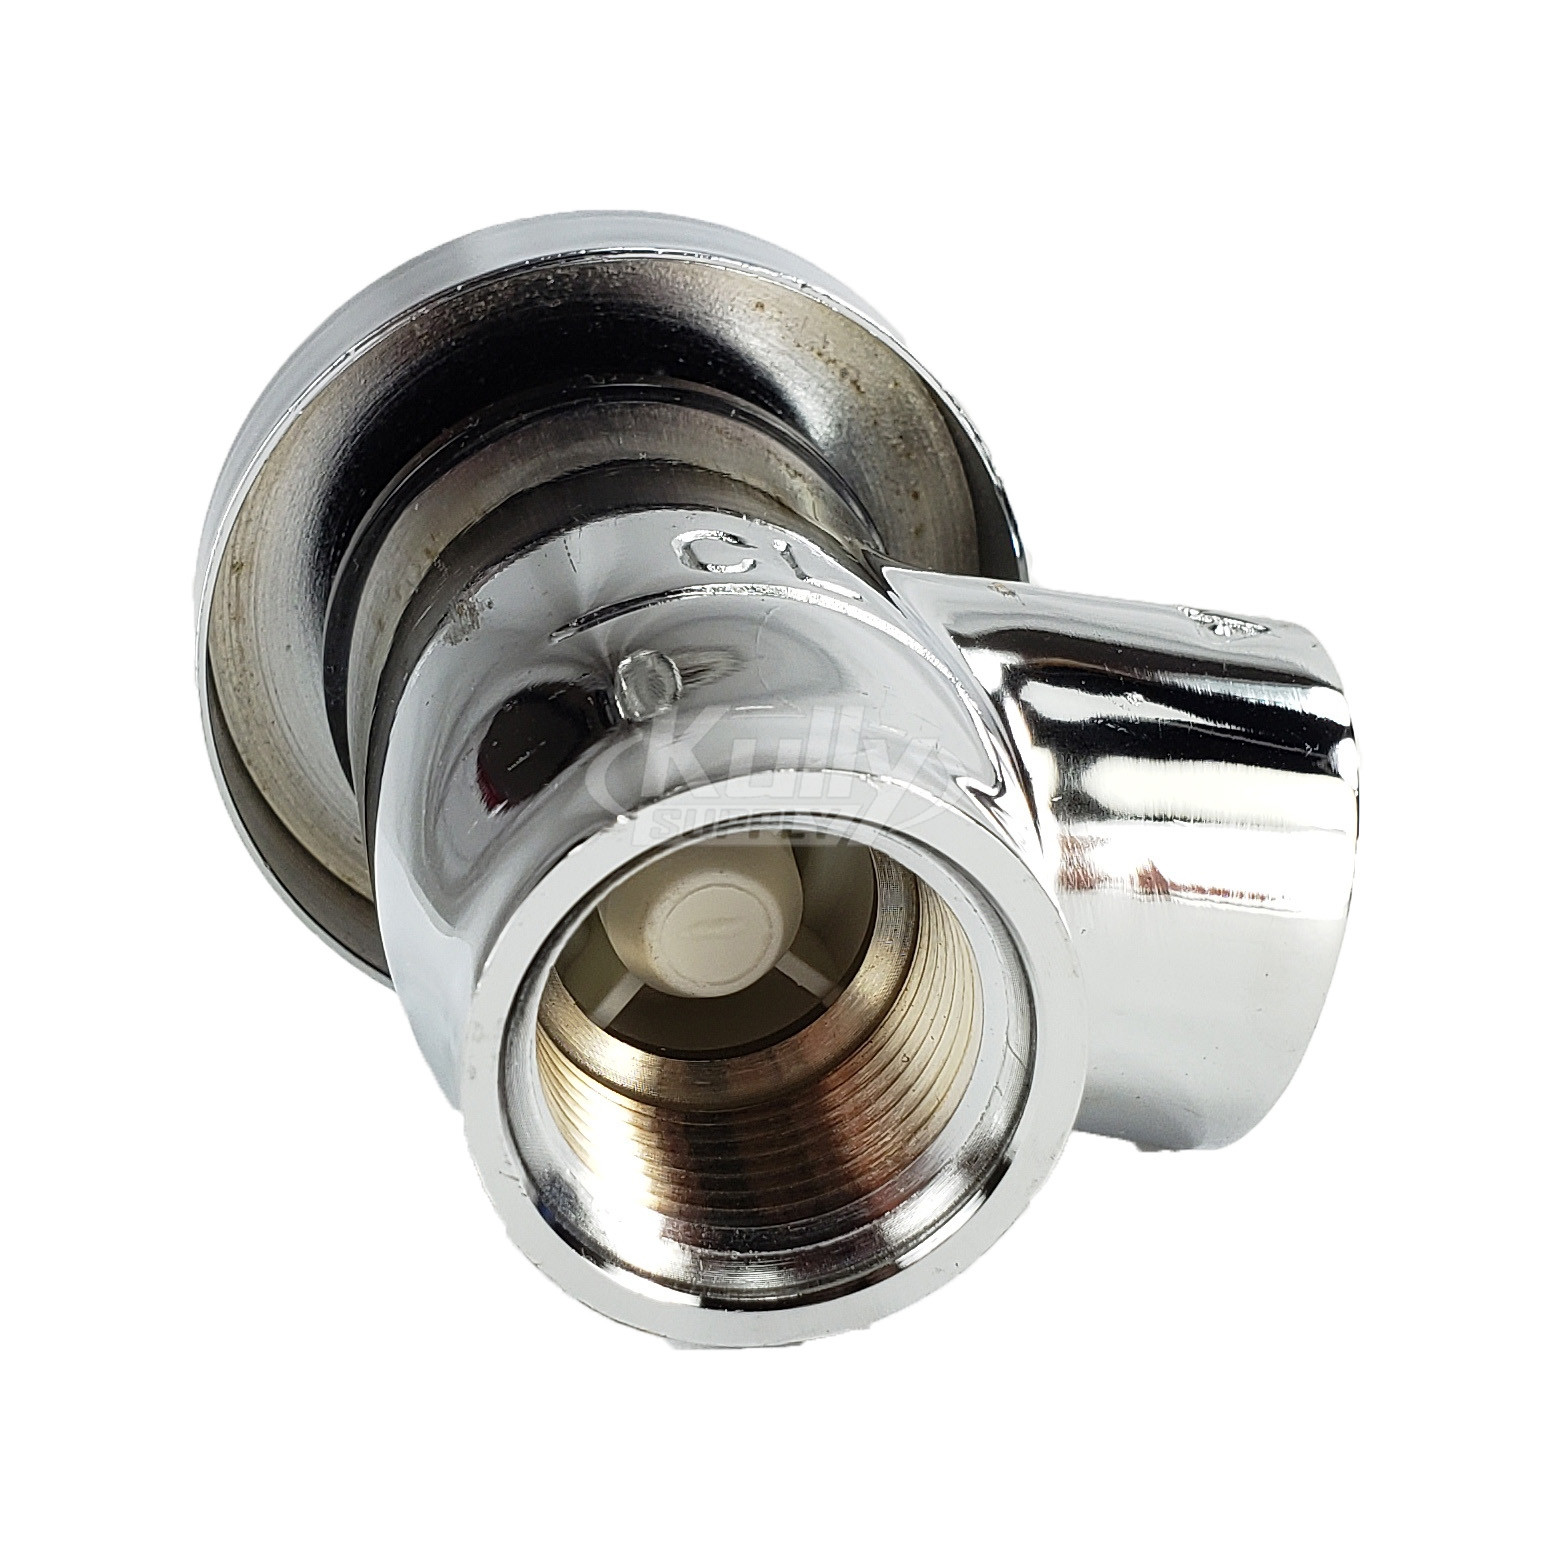 Watts 288a 3 4 Quot Chrome Vacuum Breaker Kullysupply Com